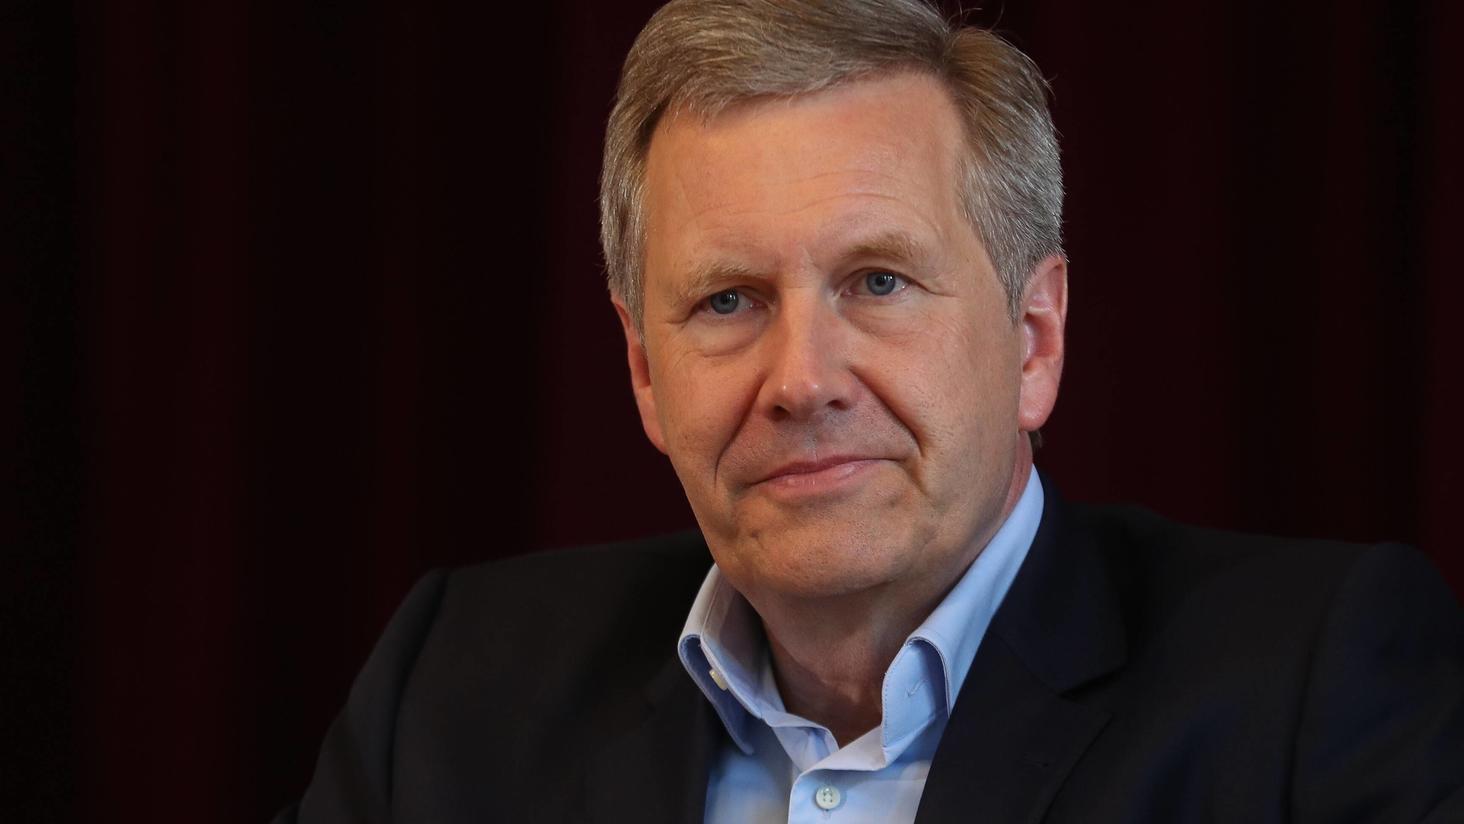 Altbundespräsident Christian Wulff